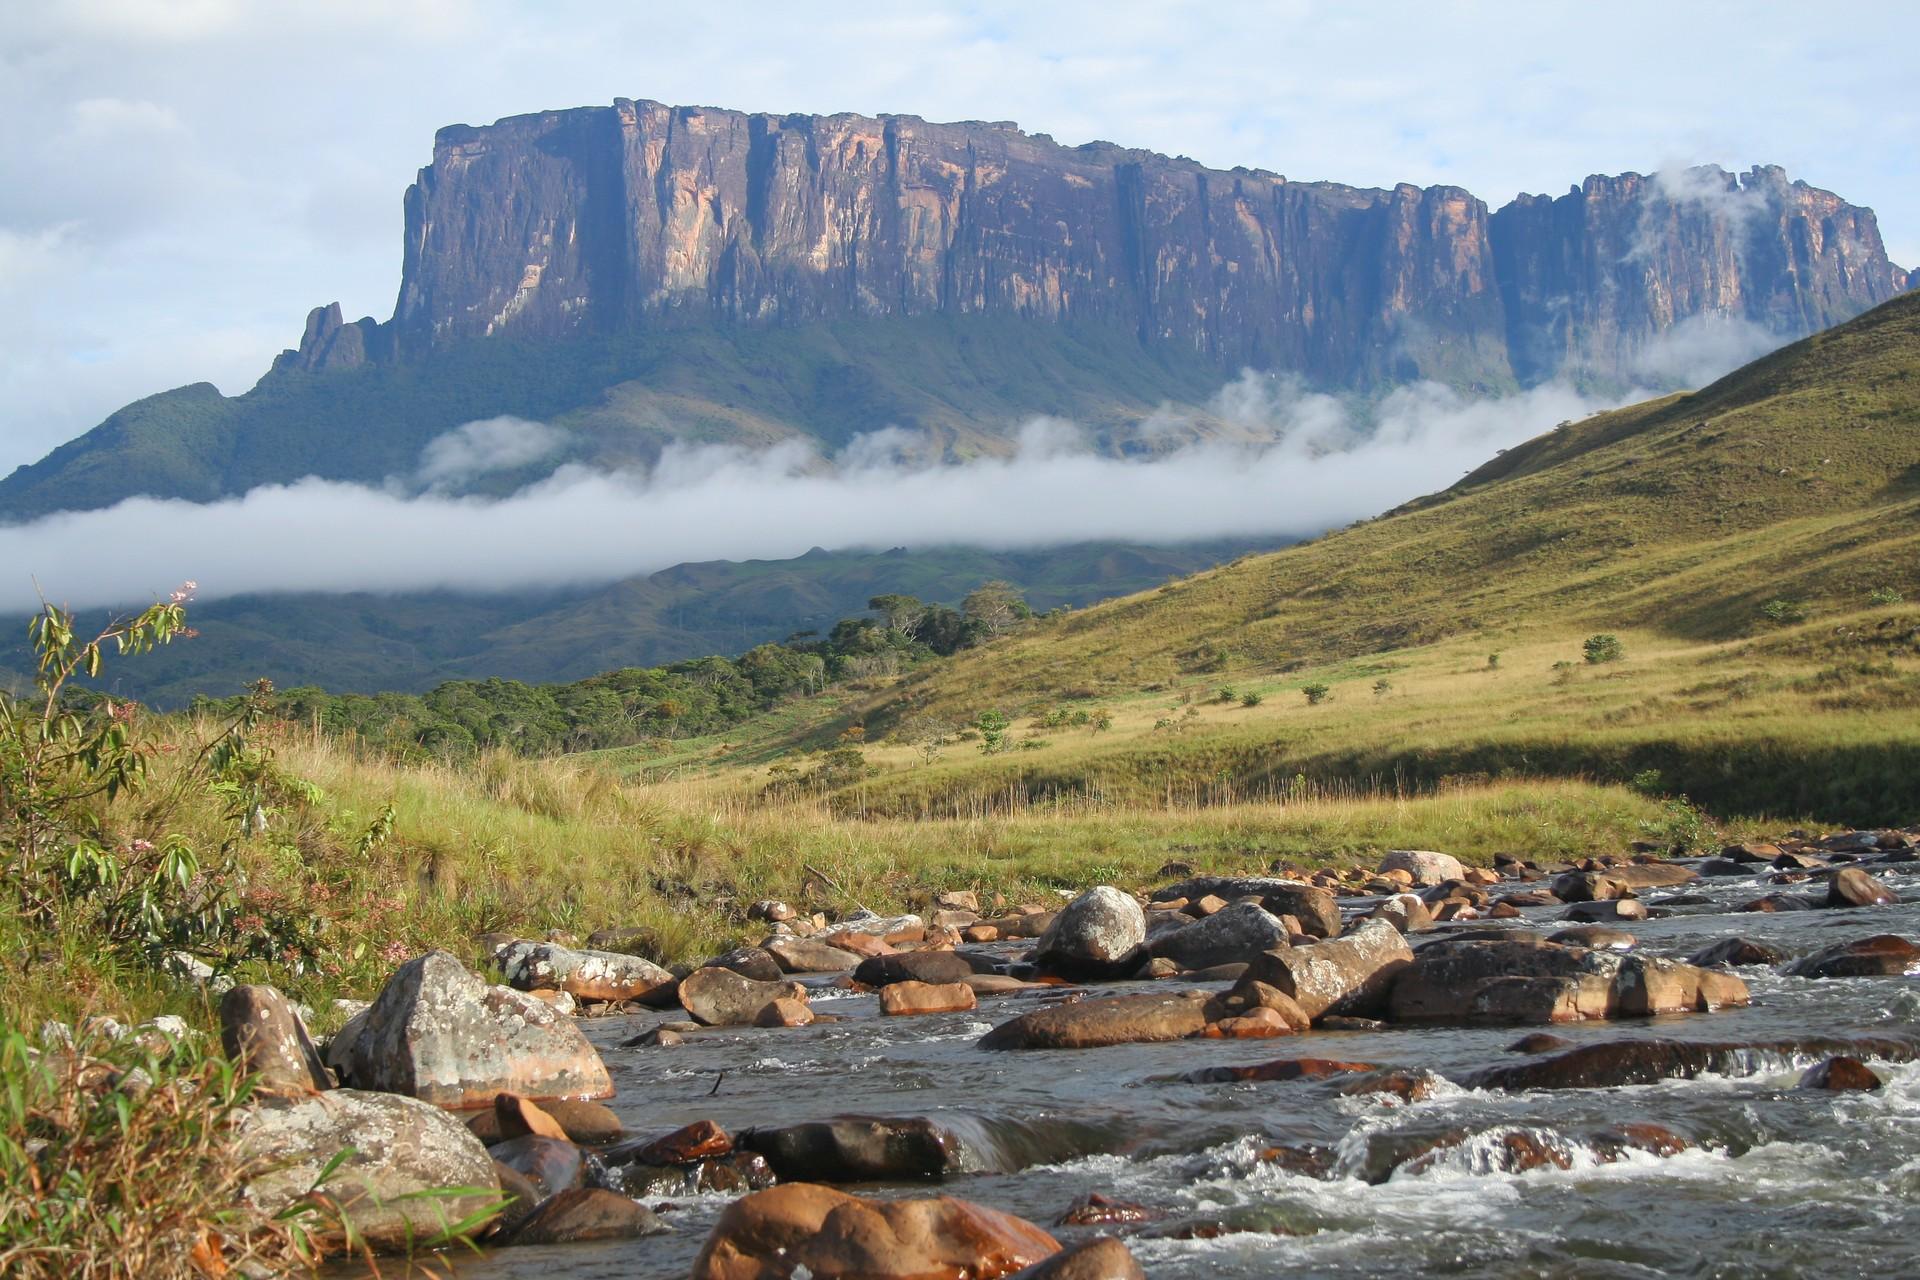 Mount Roraima on the border of Brazil, Guyana and Venezuela